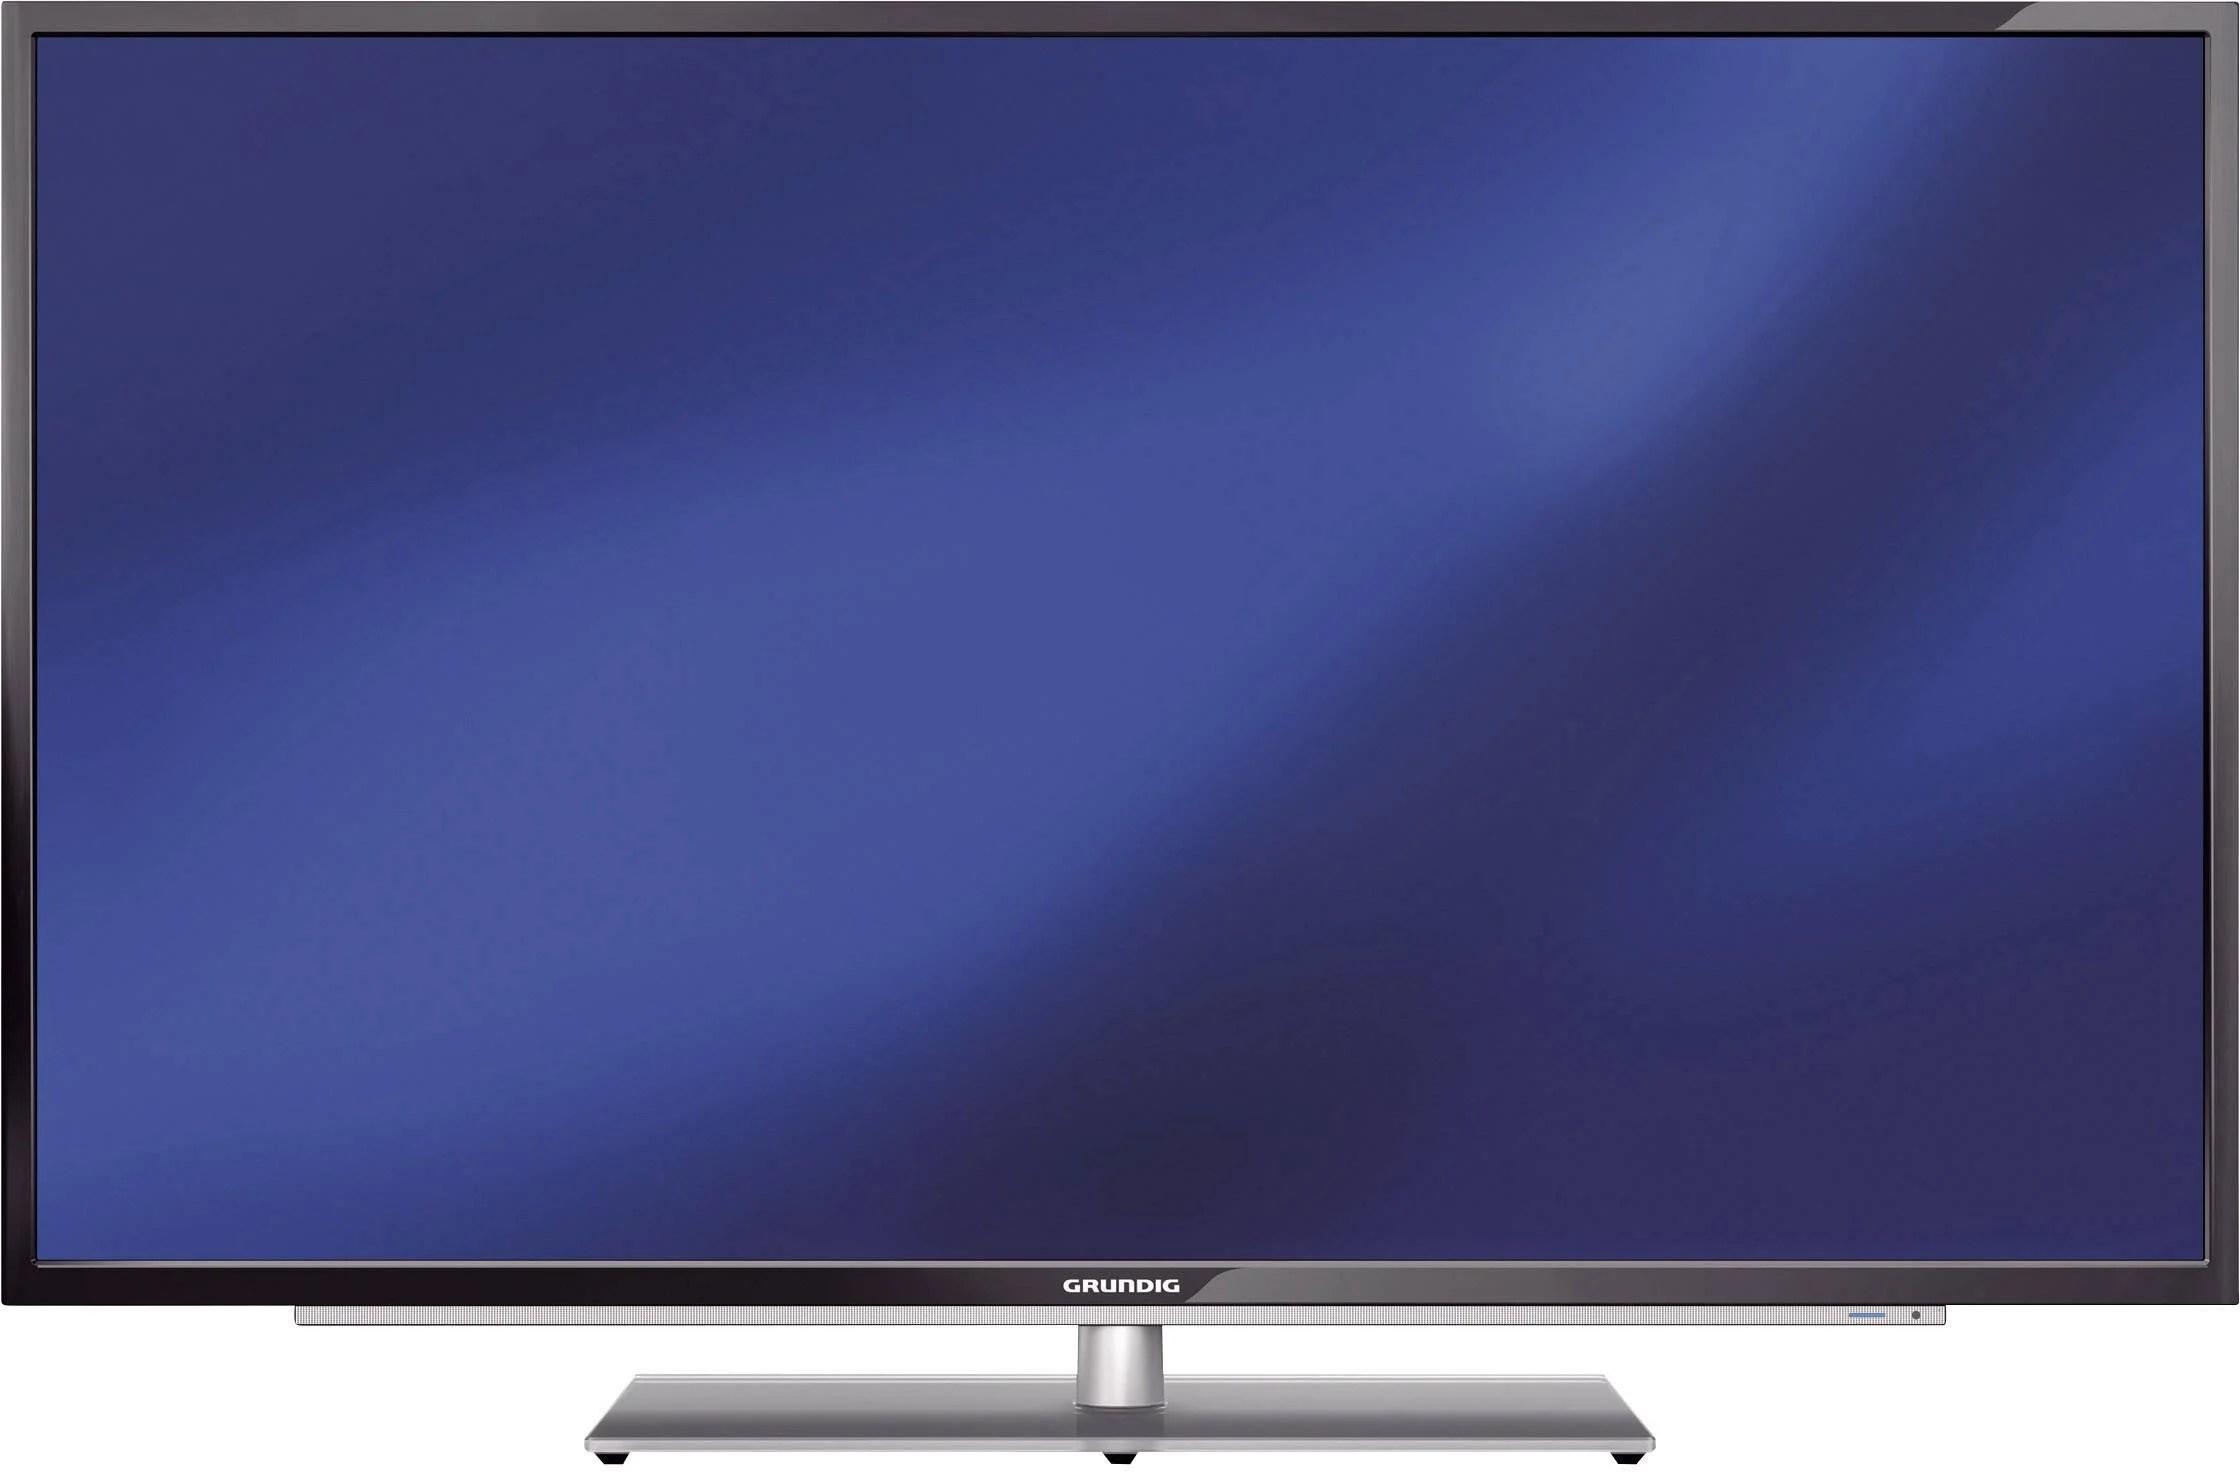 grundig 55 vle 922 led tv 140 cm 55 inch dvb t dvb c dvb s full hd 3d smart tv wi fi ready ci black glossy